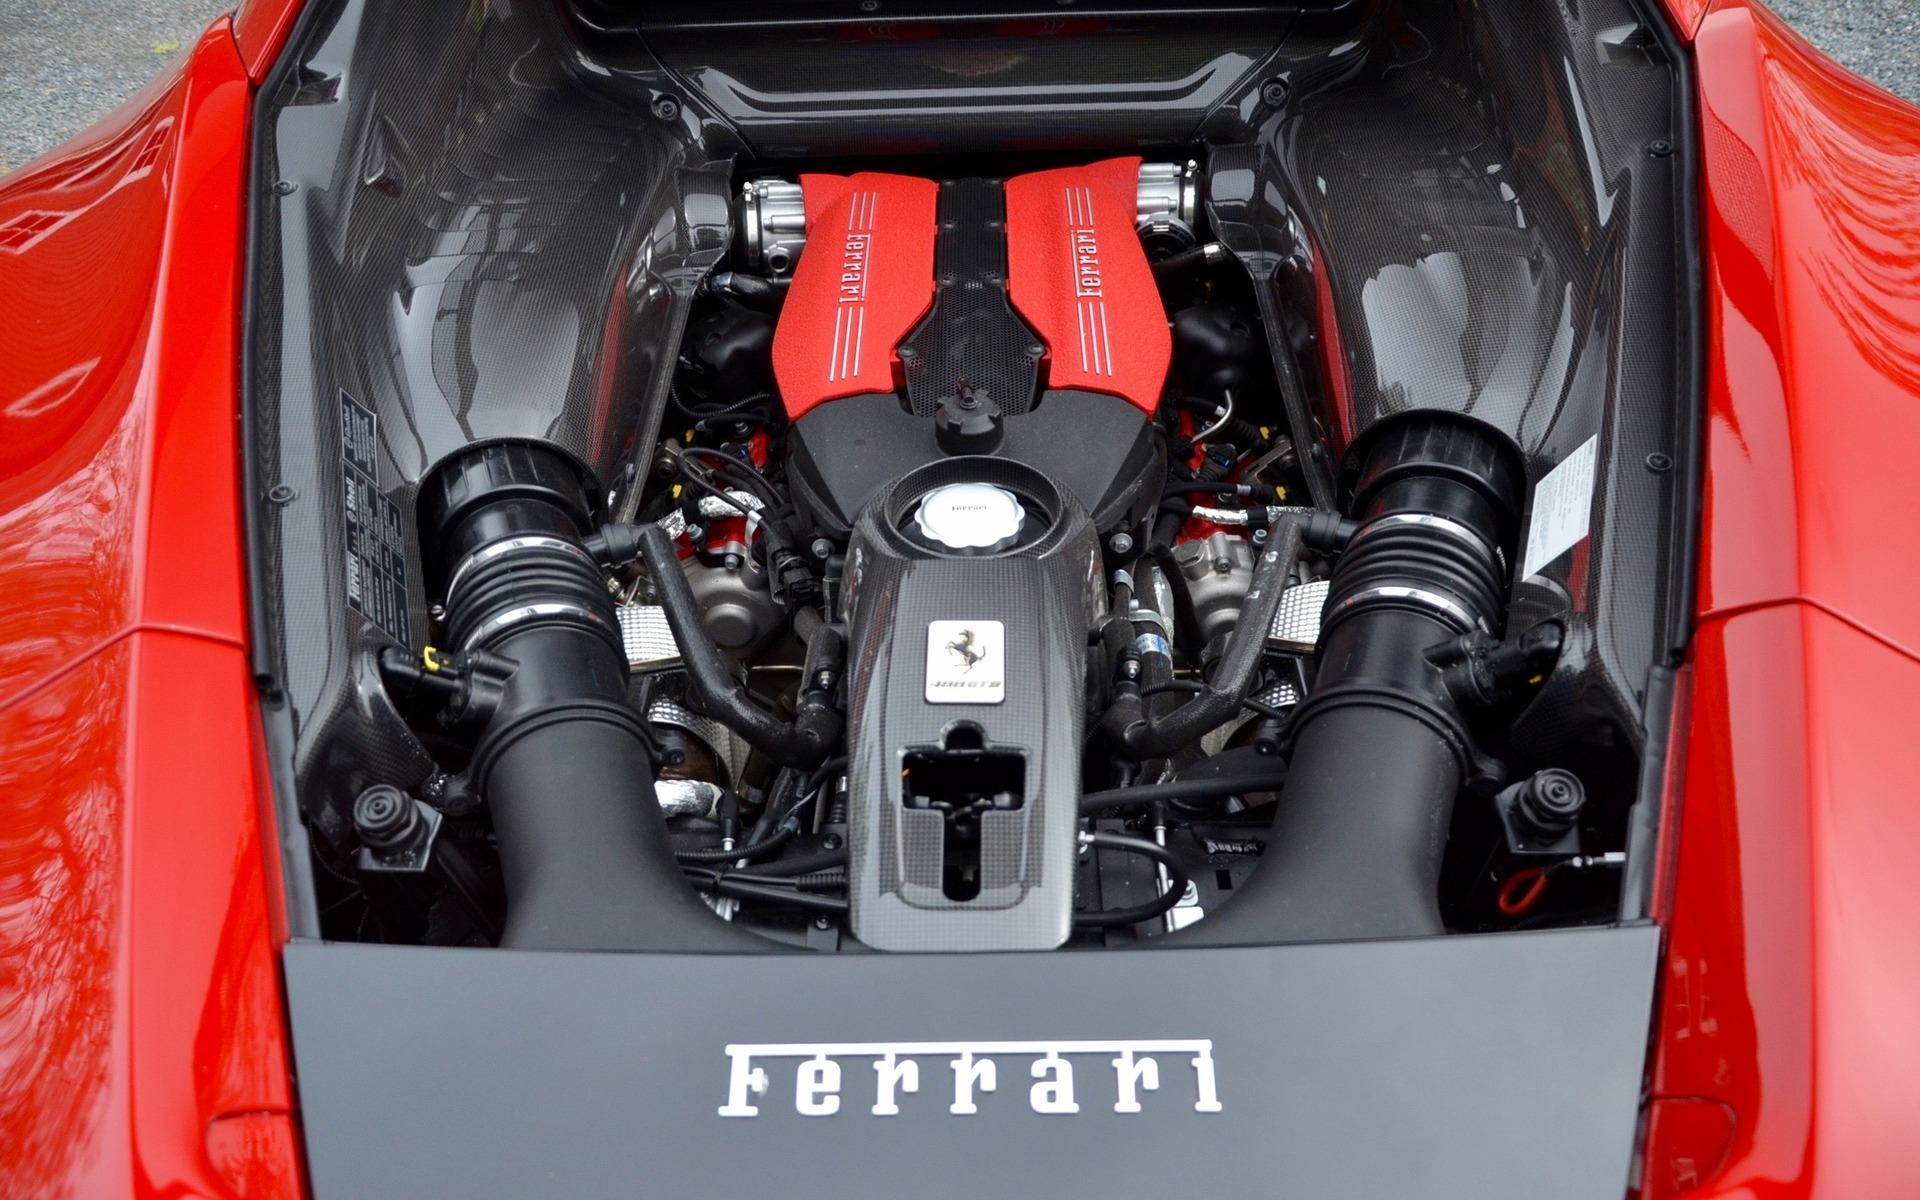 3.9-litre twin-turbo V8 from Ferrari